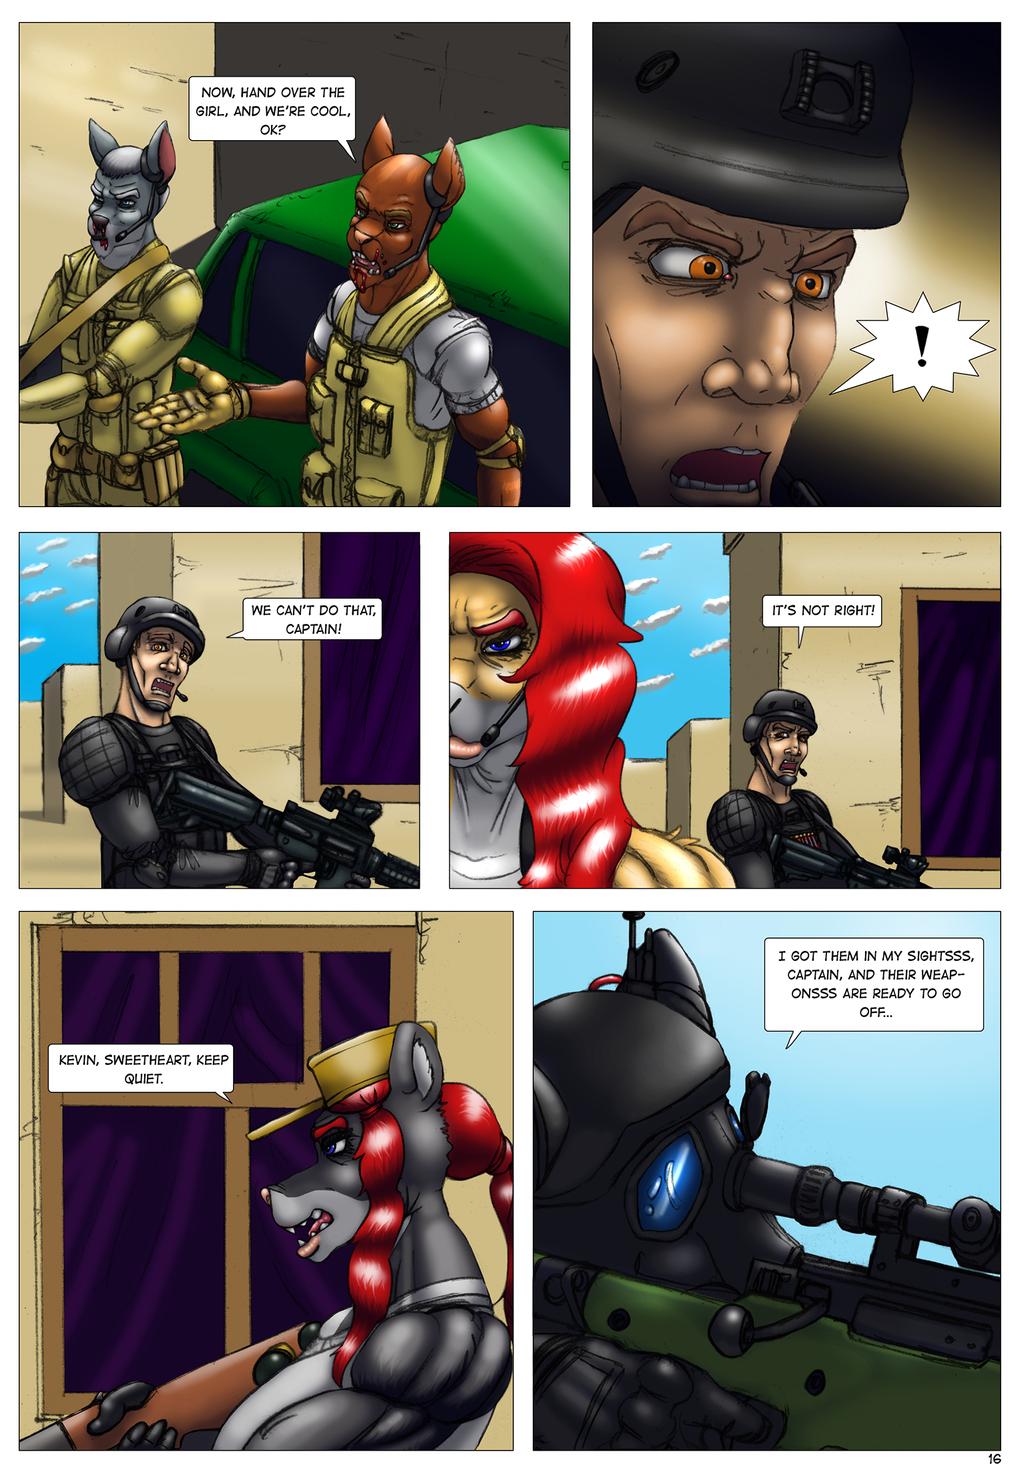 Retribution (page 16)